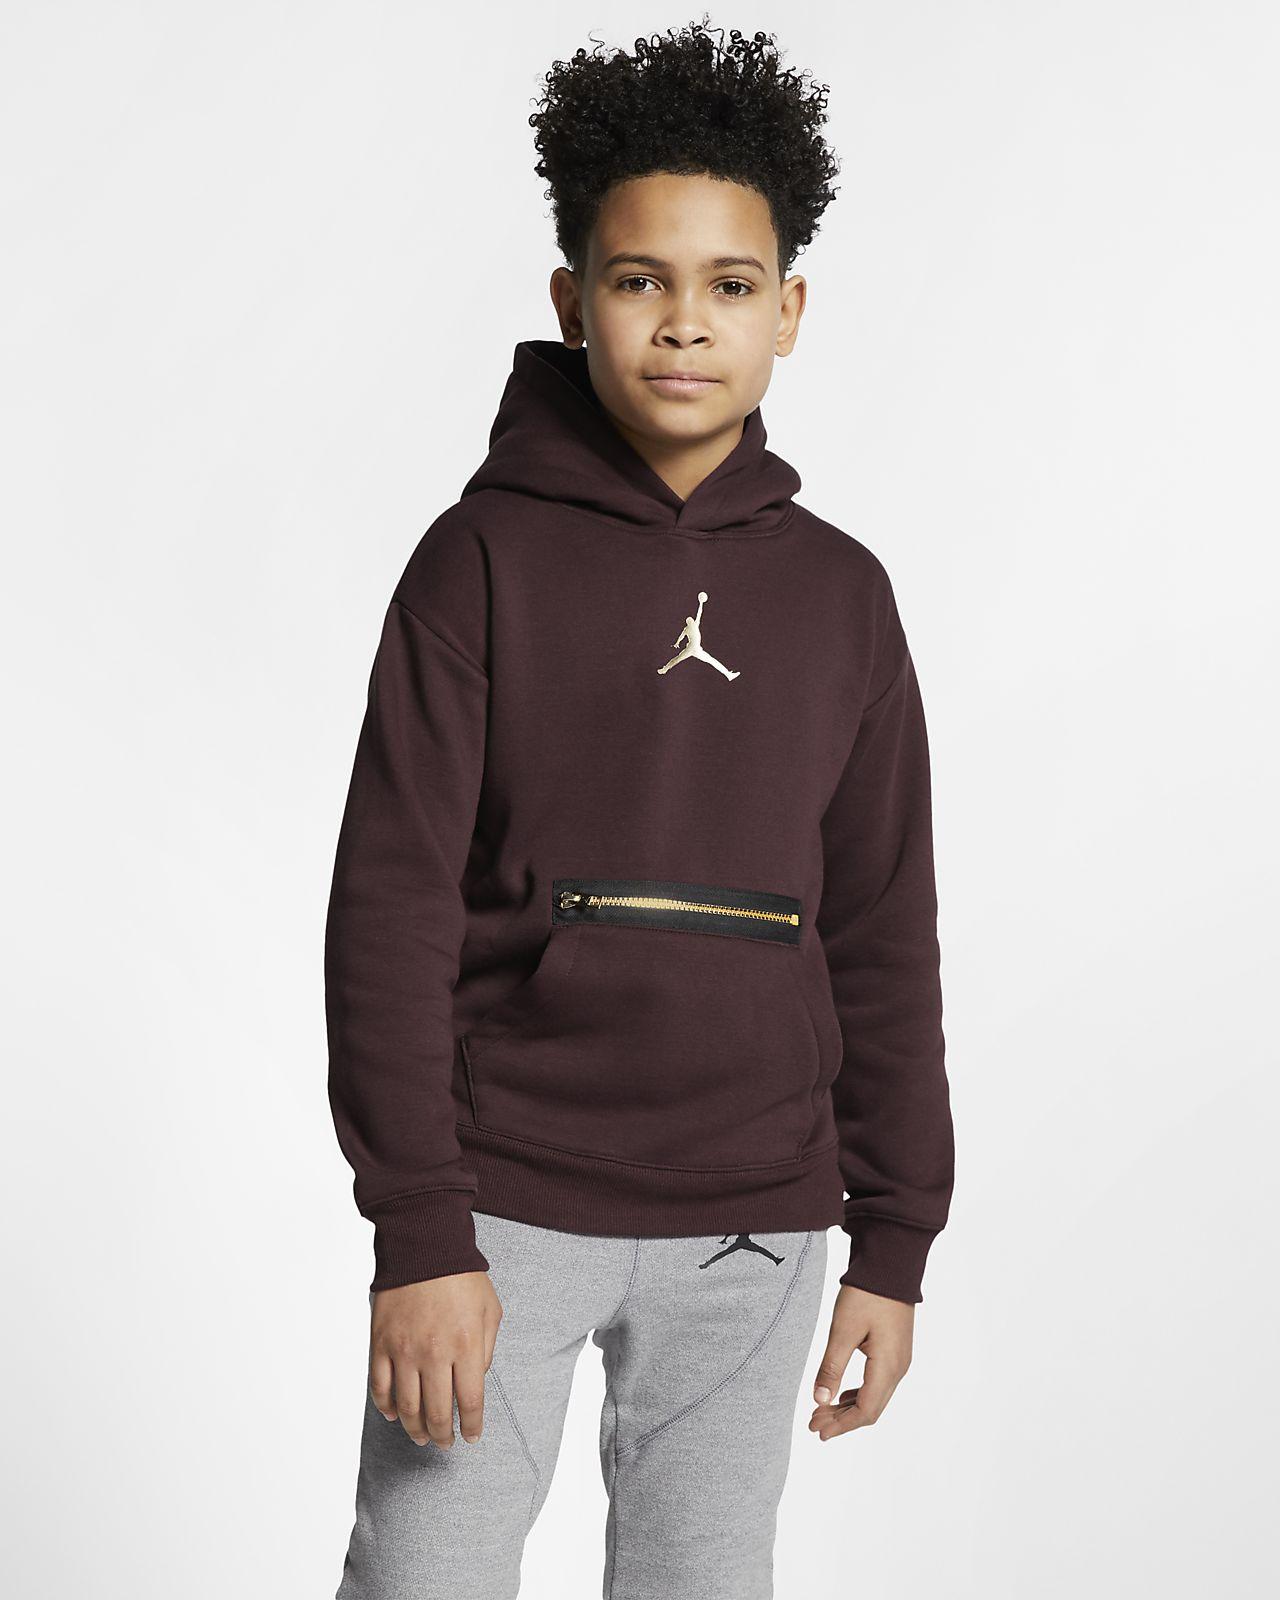 Felpa pullover con cappuccio Jordan - Ragazzi